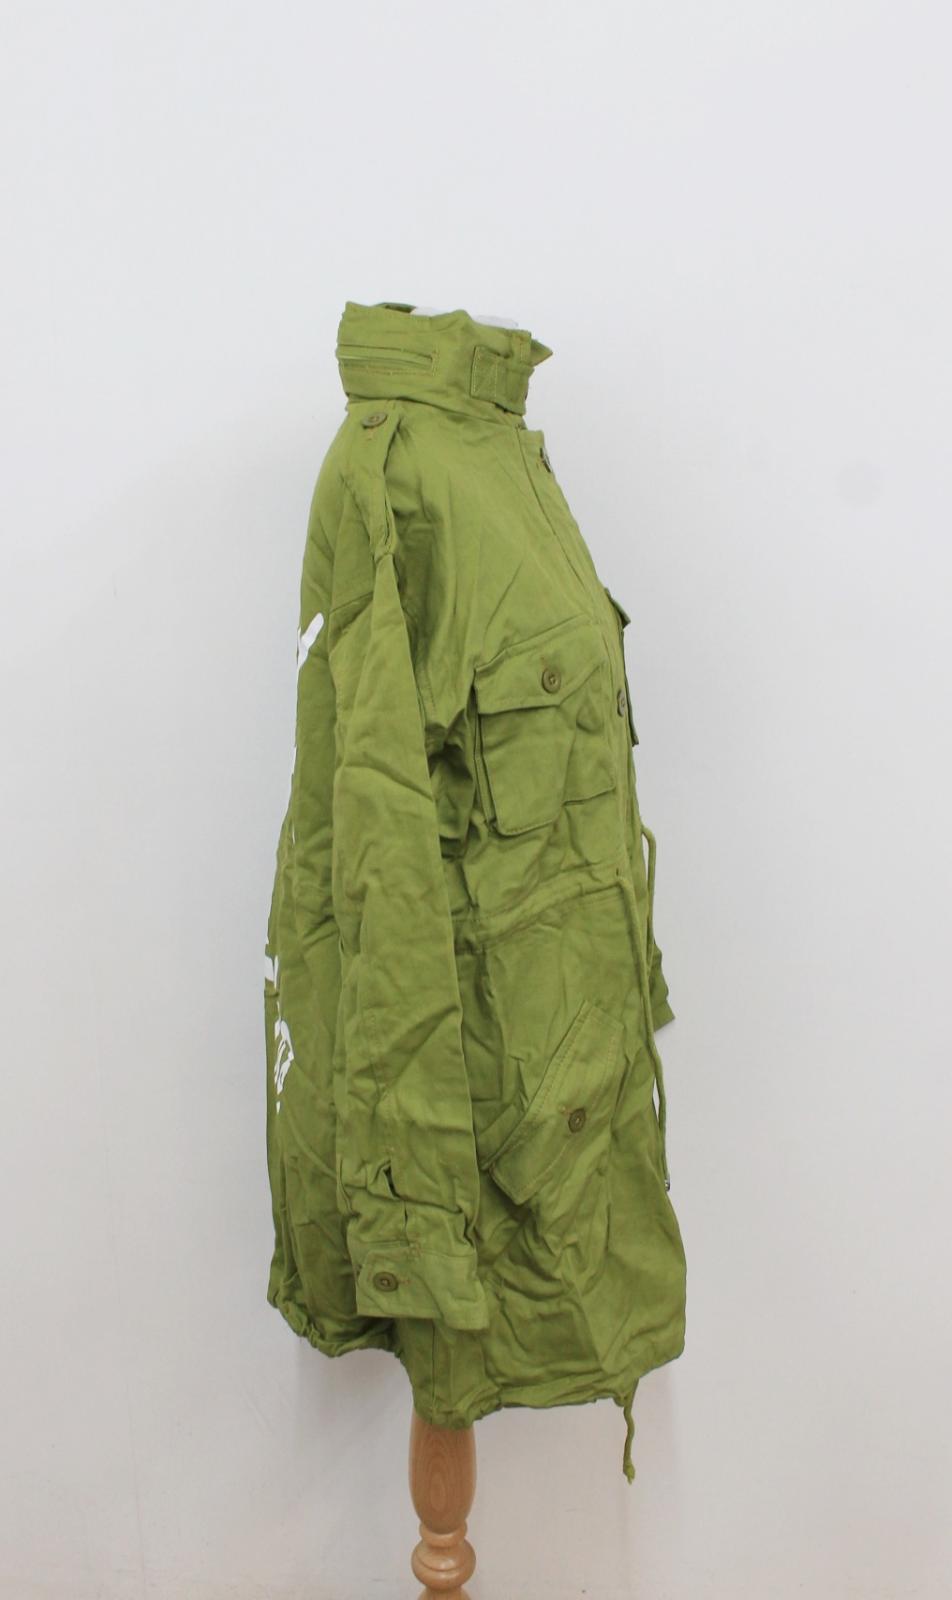 Manica Real Don Jacket Neon Green Lunga Do Successivo Atlantic Ladies 't M I Care U Rgqw0CIx